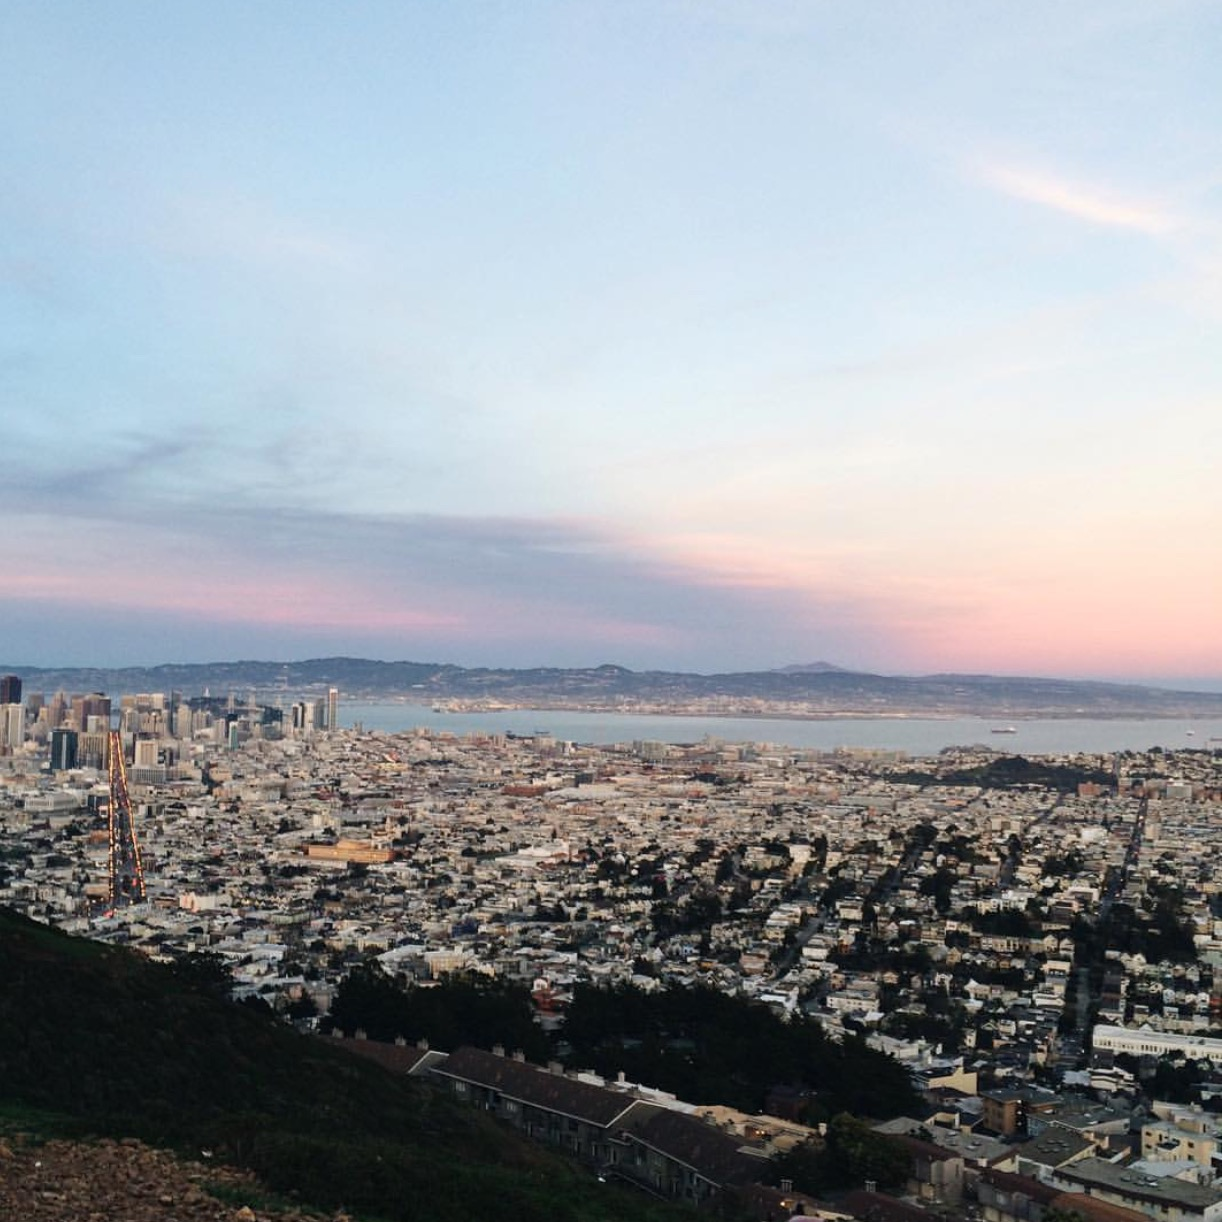 Repost of Twin Peaks Sunset